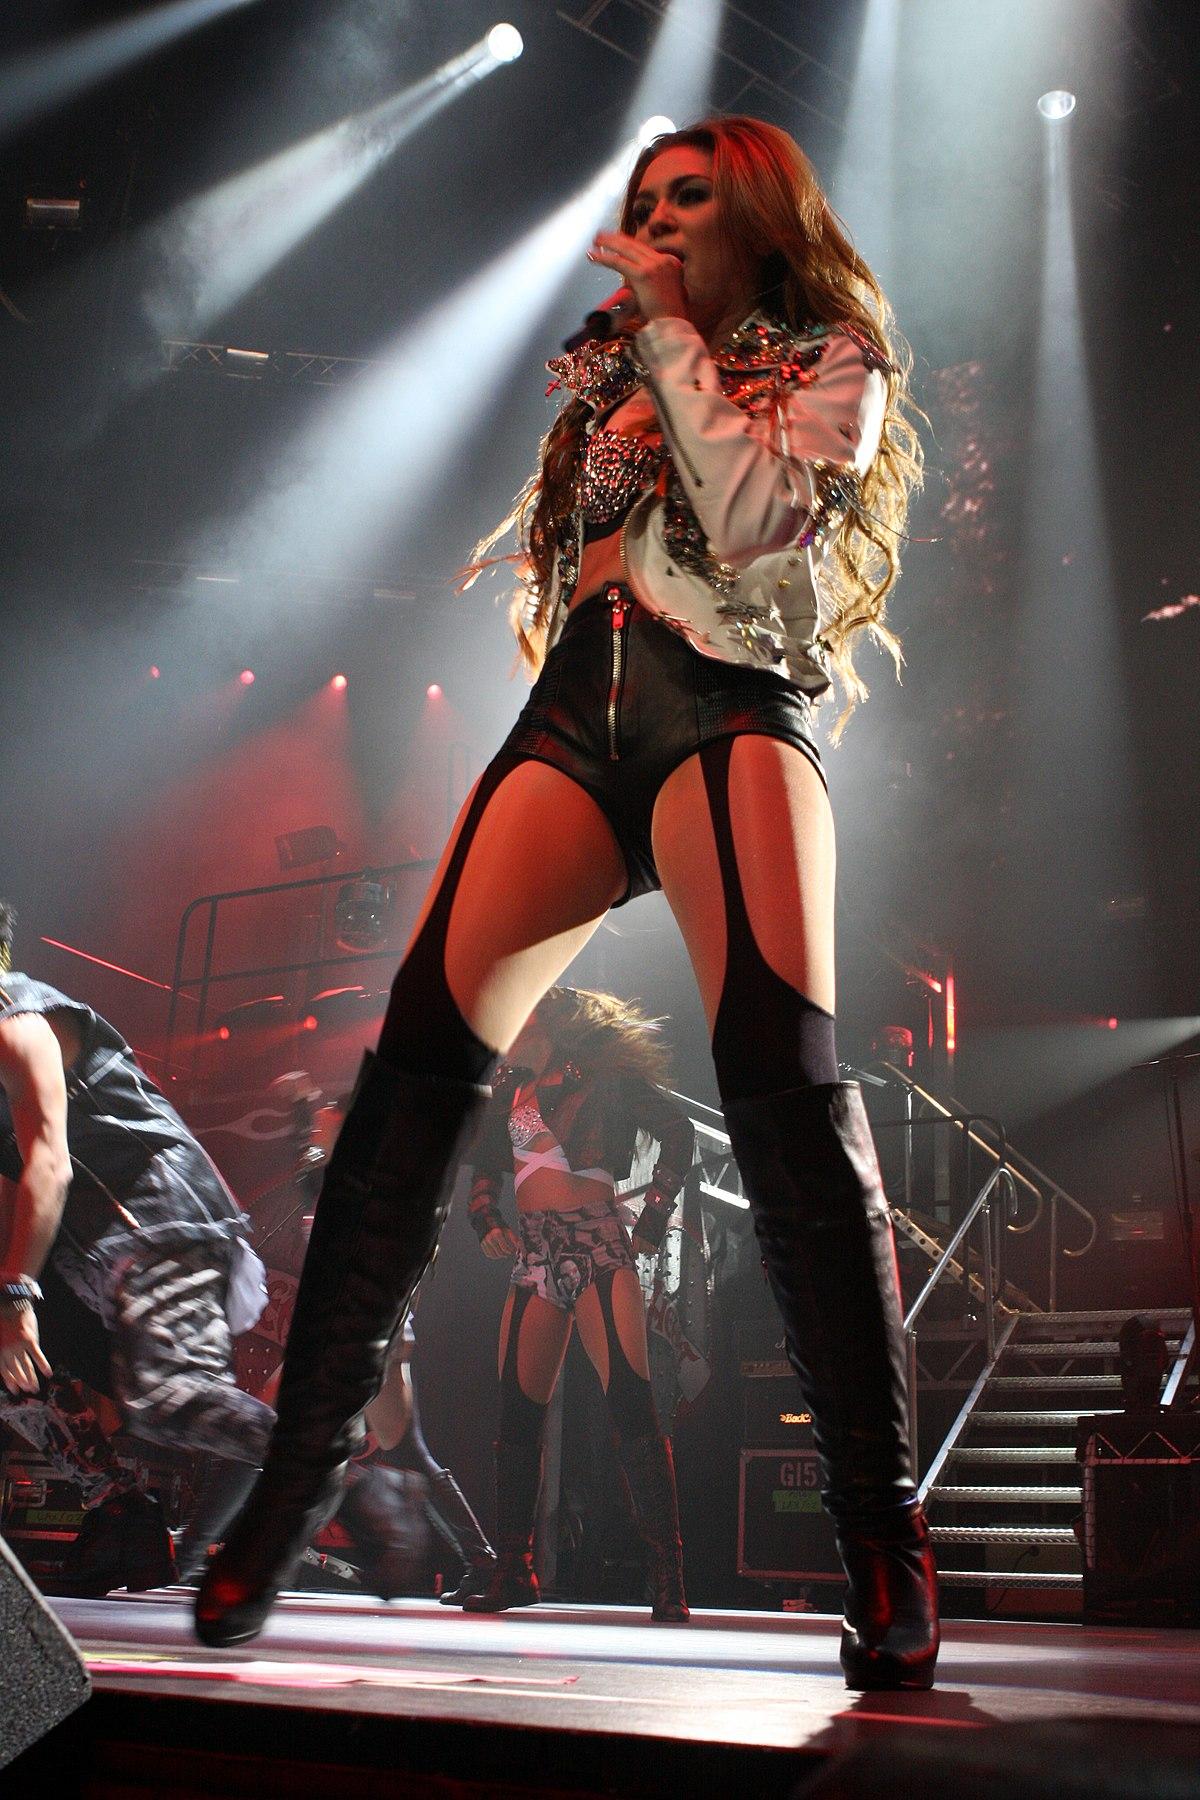 Miley Cyrus Gypsy Heart Tour